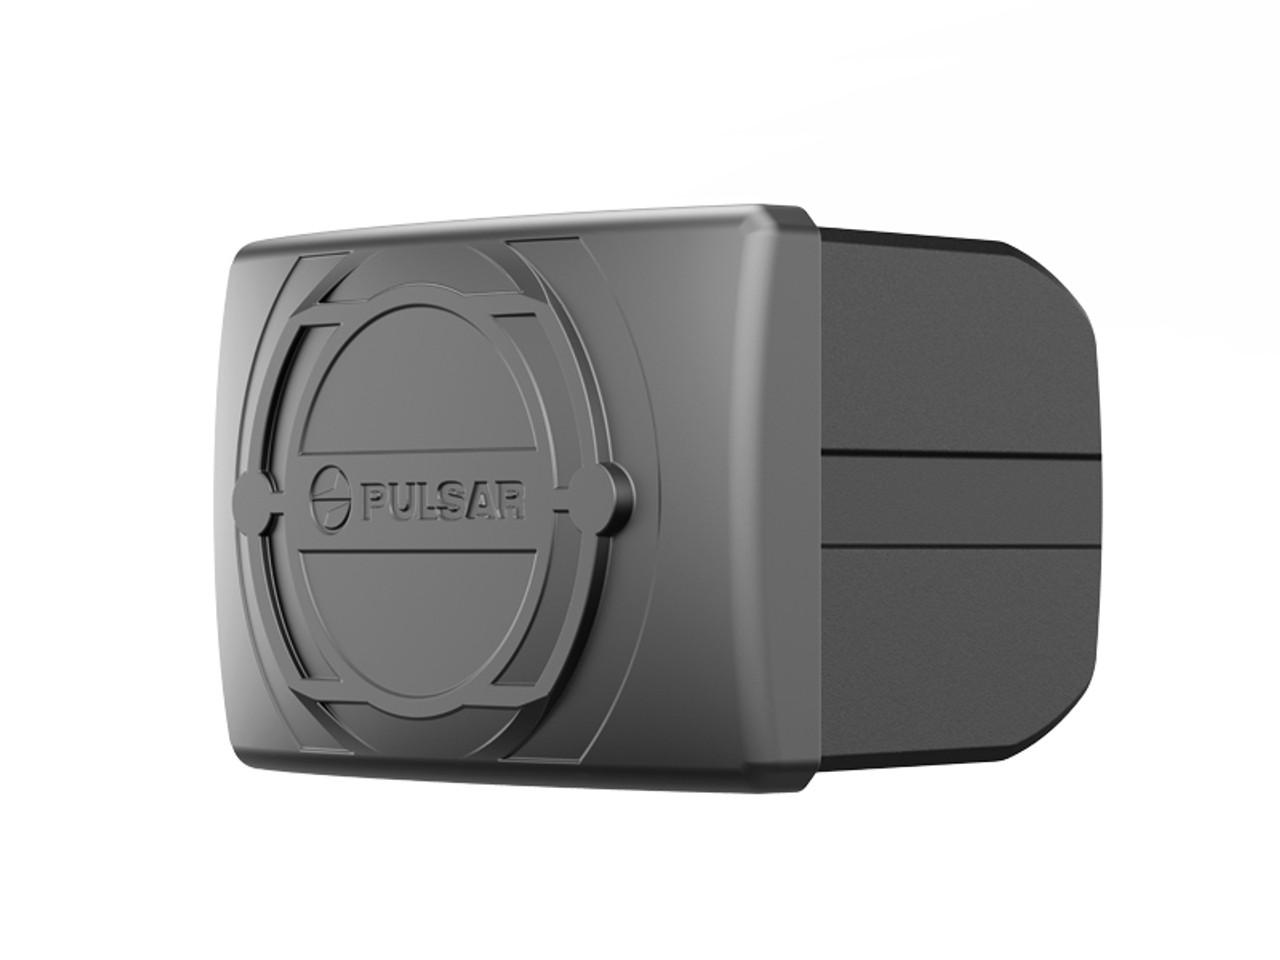 Pulsar IPS10 Battery Pack